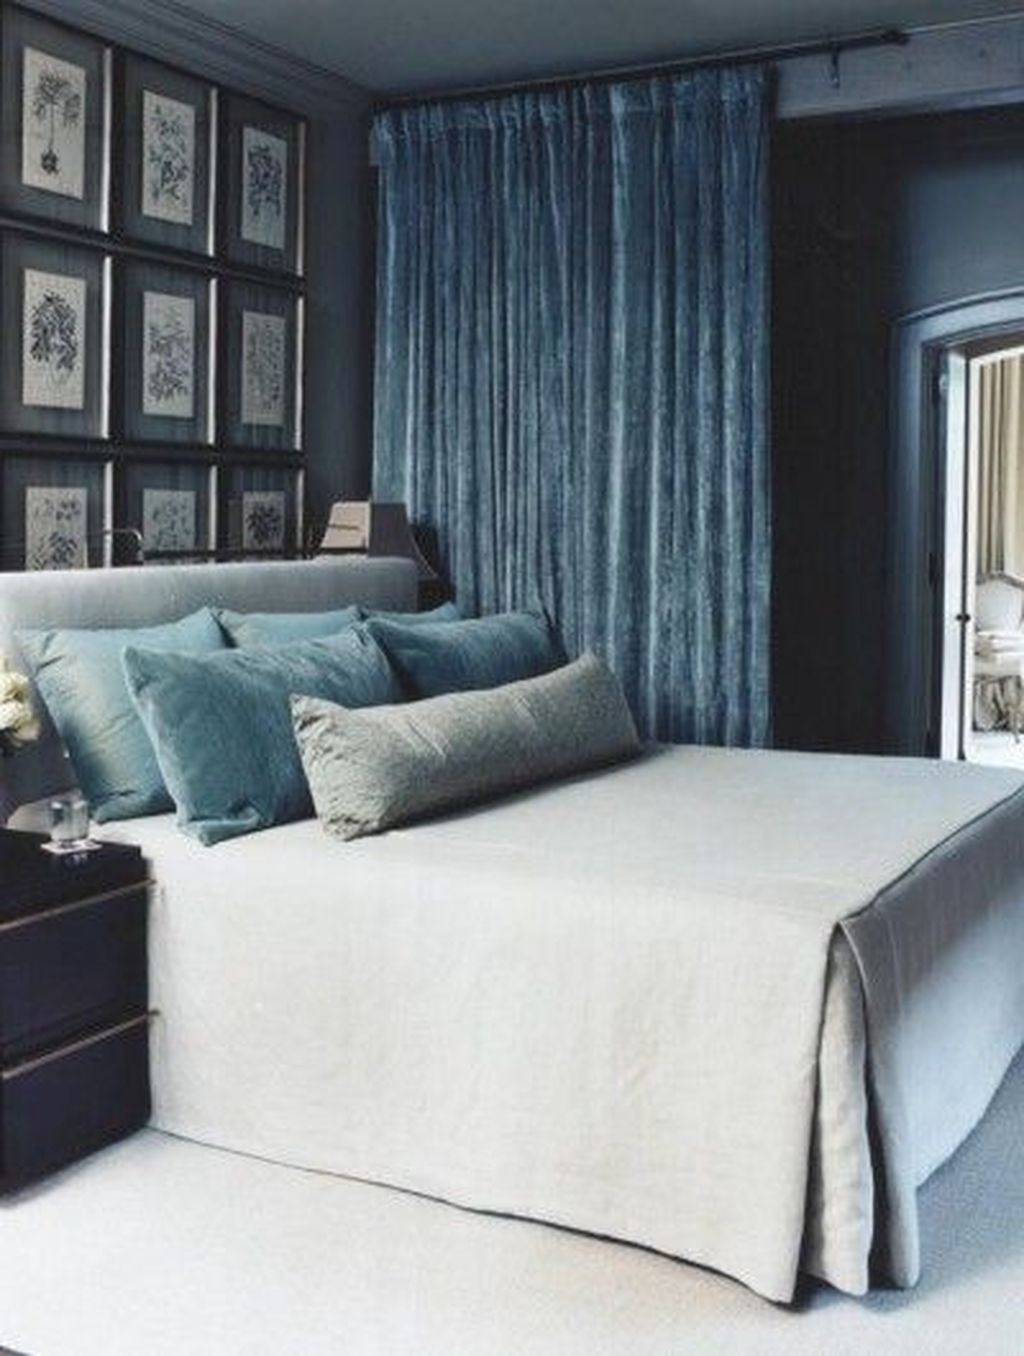 Elegant And Minimalist Master Bedroom Design Trends Ideas